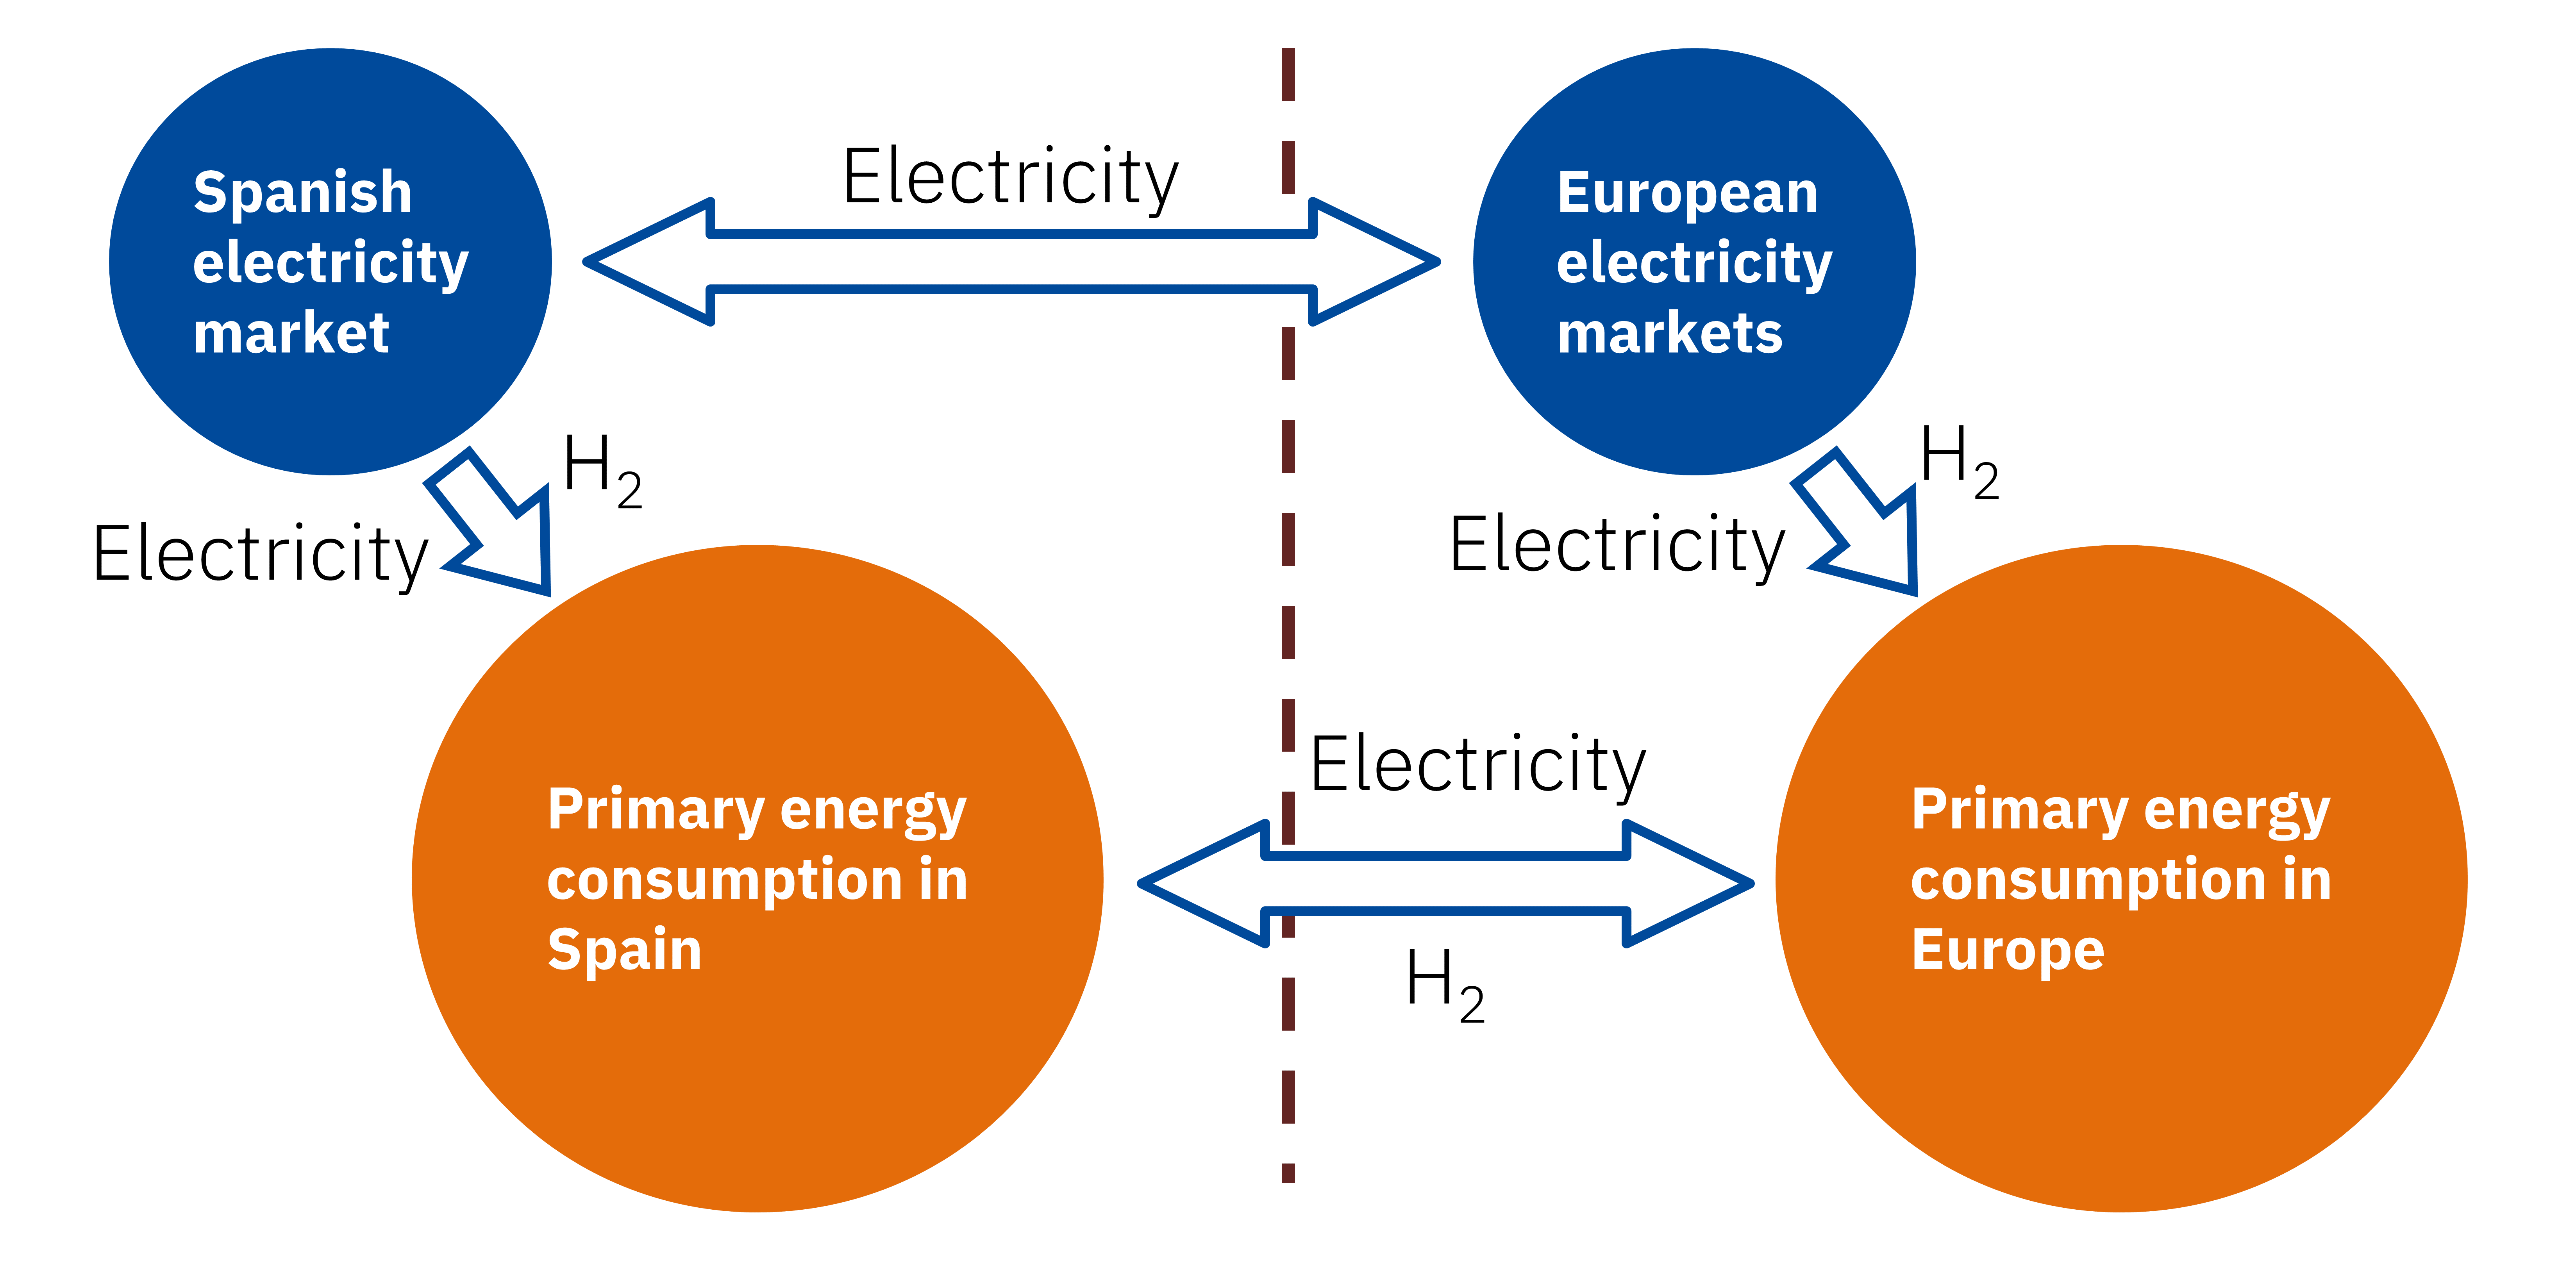 AleaSoft - Energy system Spain Europe electricity green hydrogen